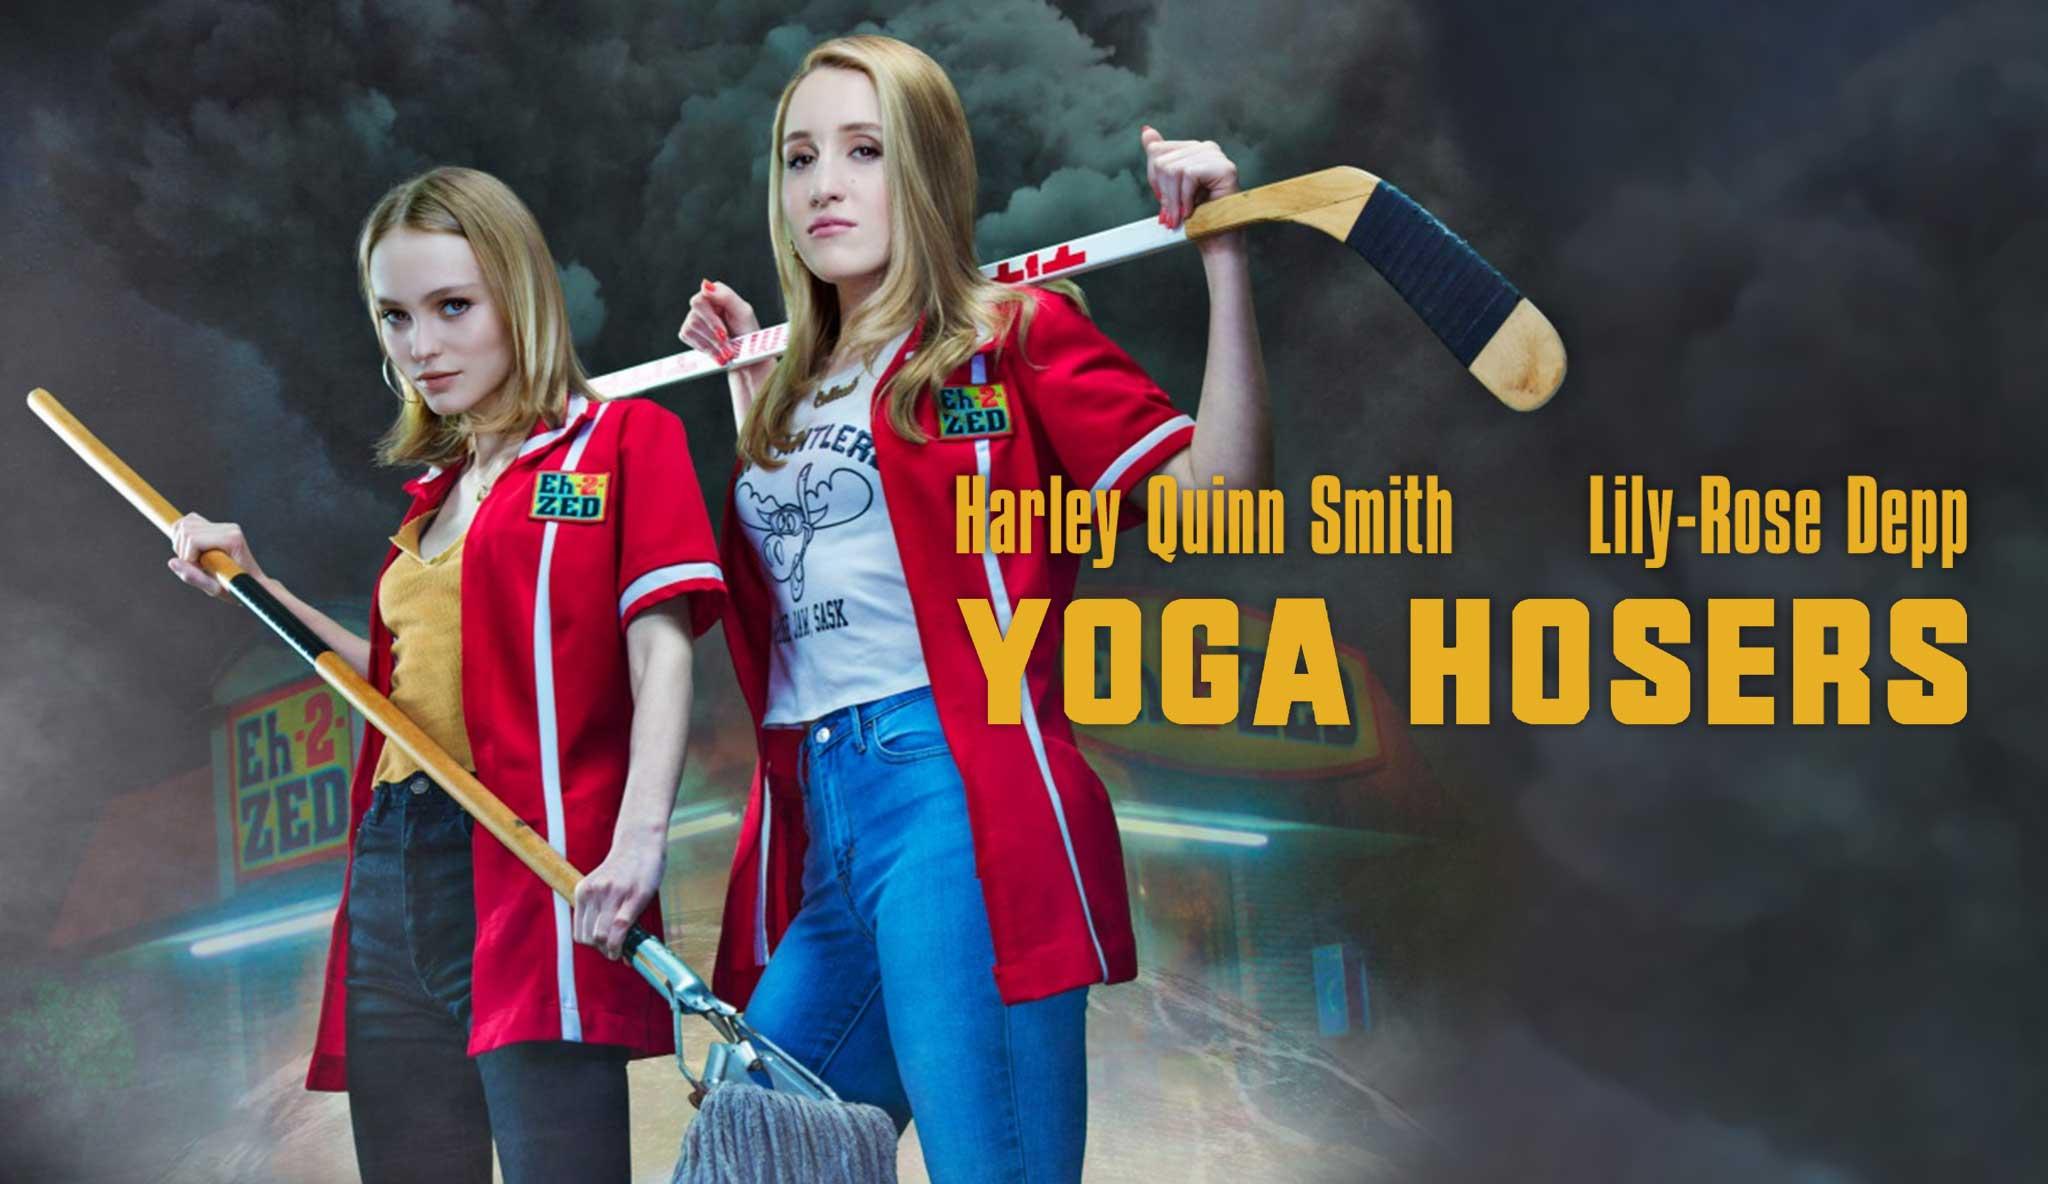 yoga-hosers\header.jpg